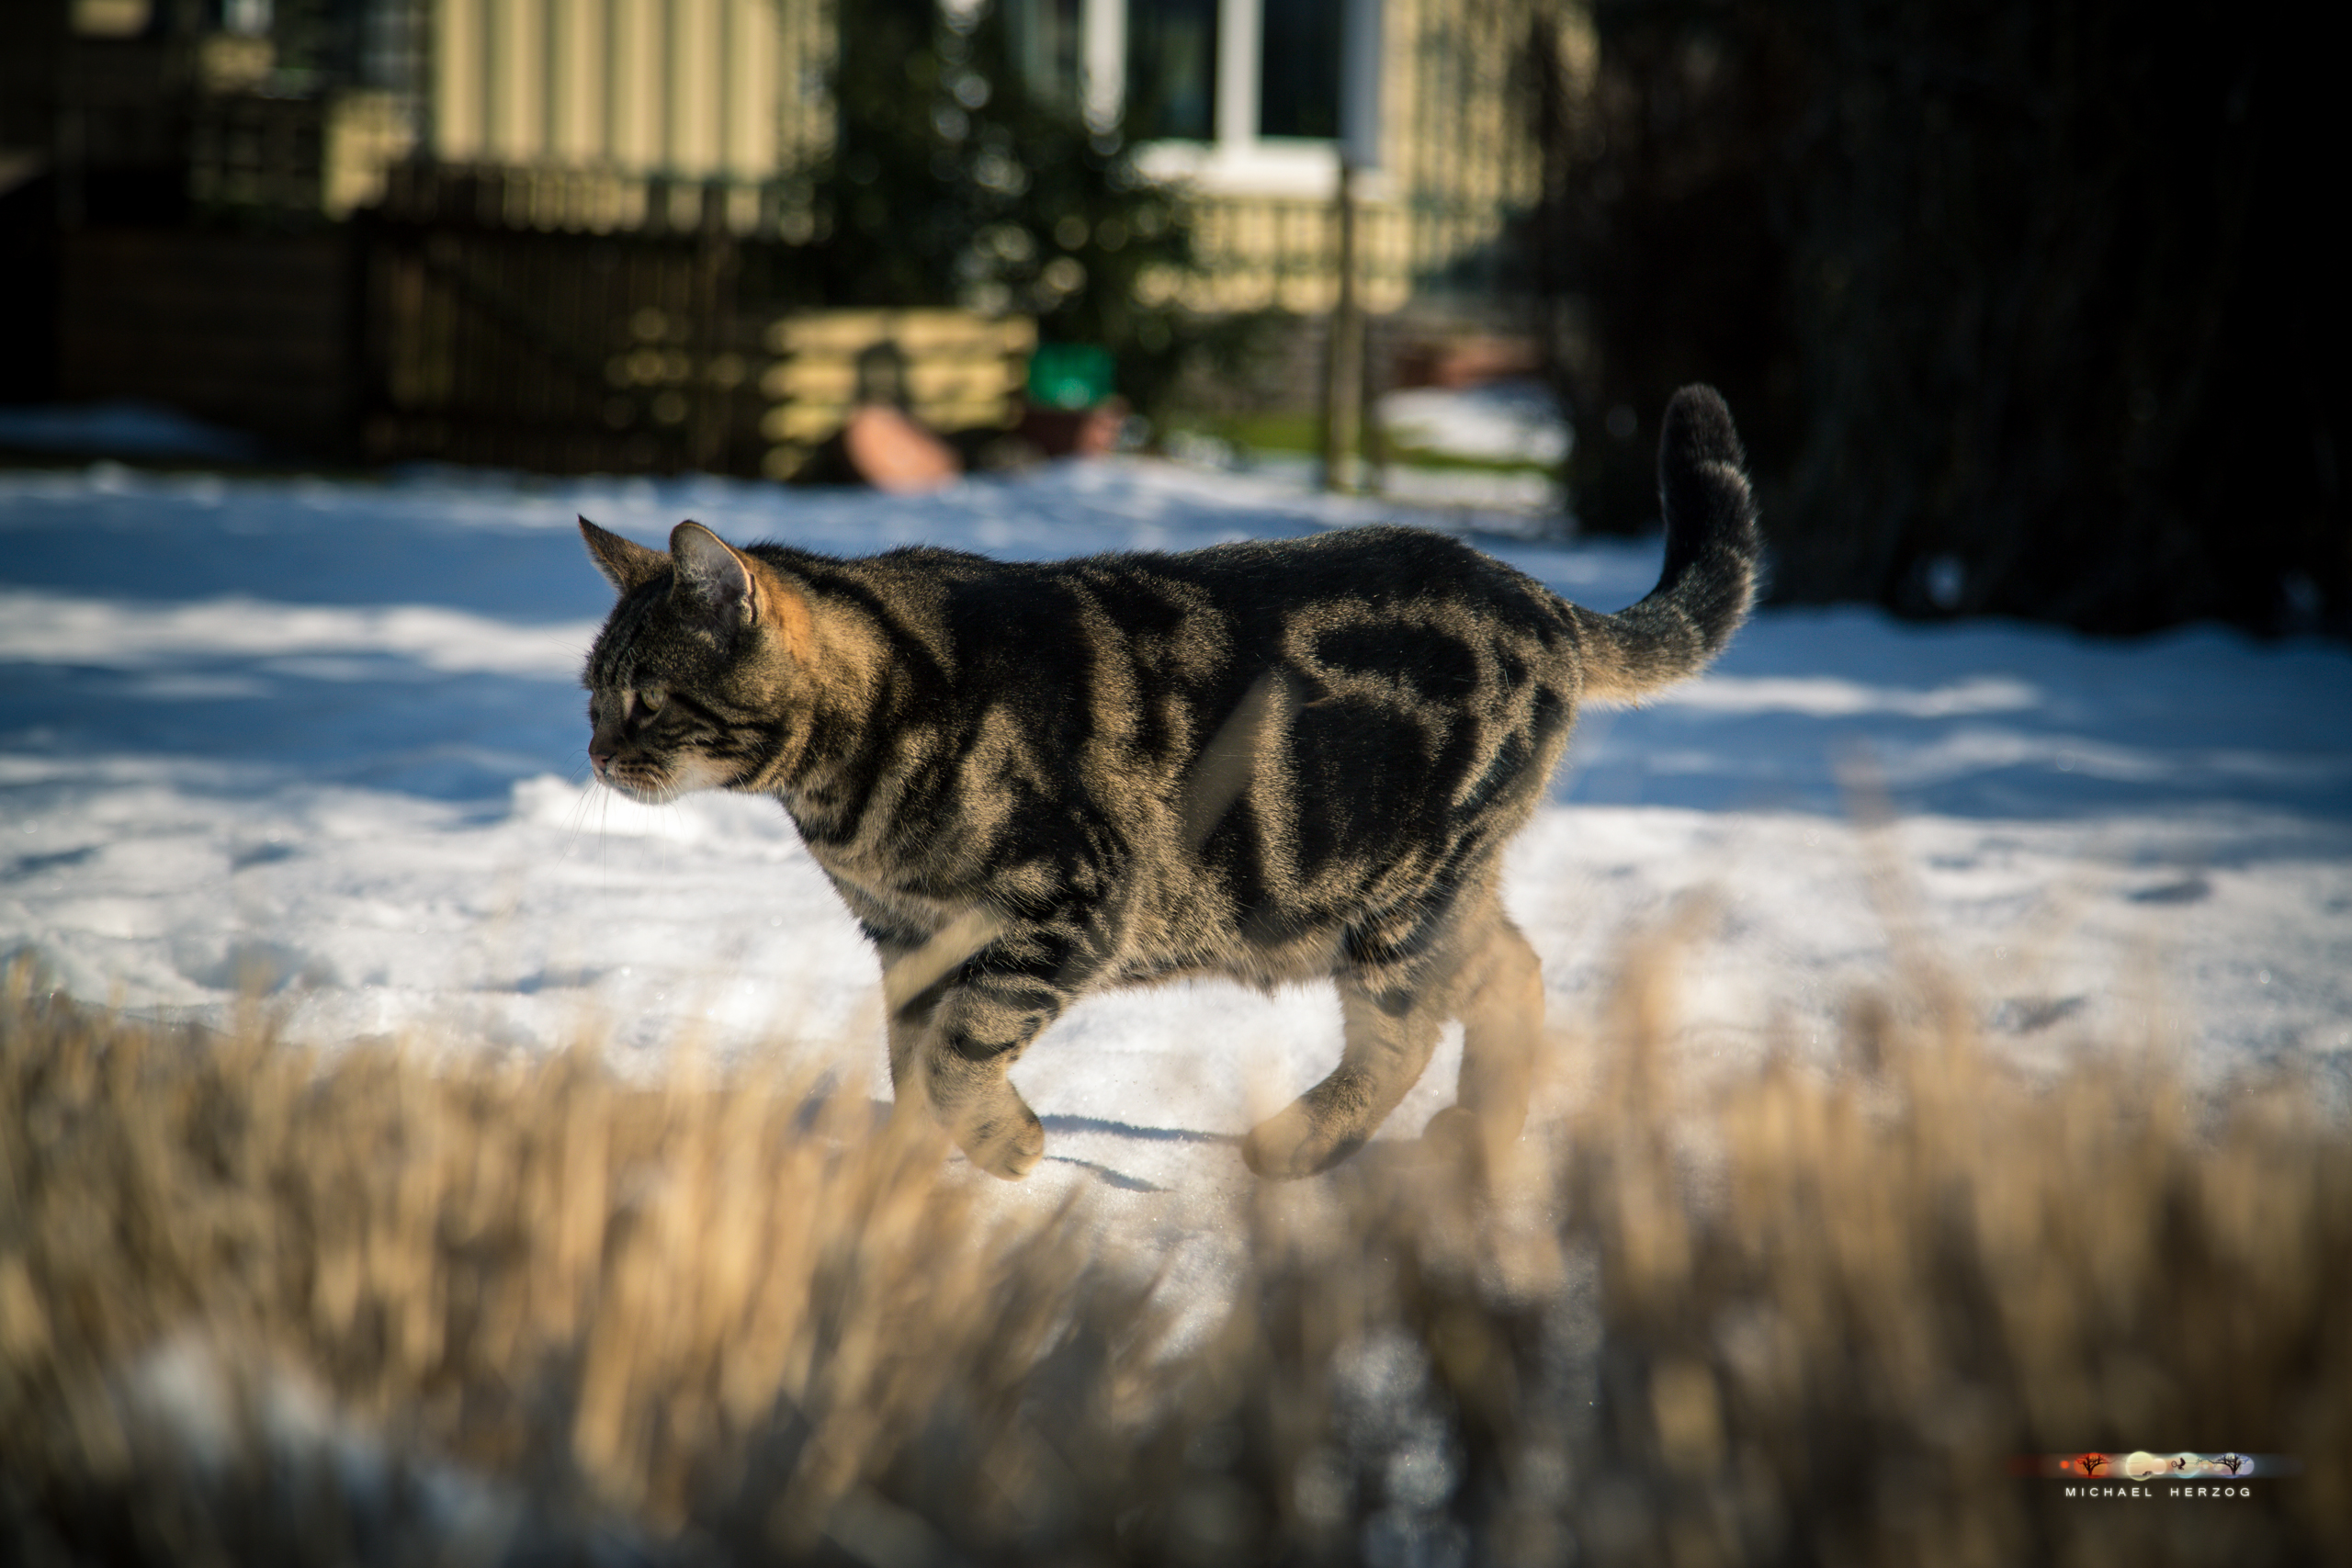 BALUARI_Winter2019_Garten_MichaelHerzog-8453.jpg